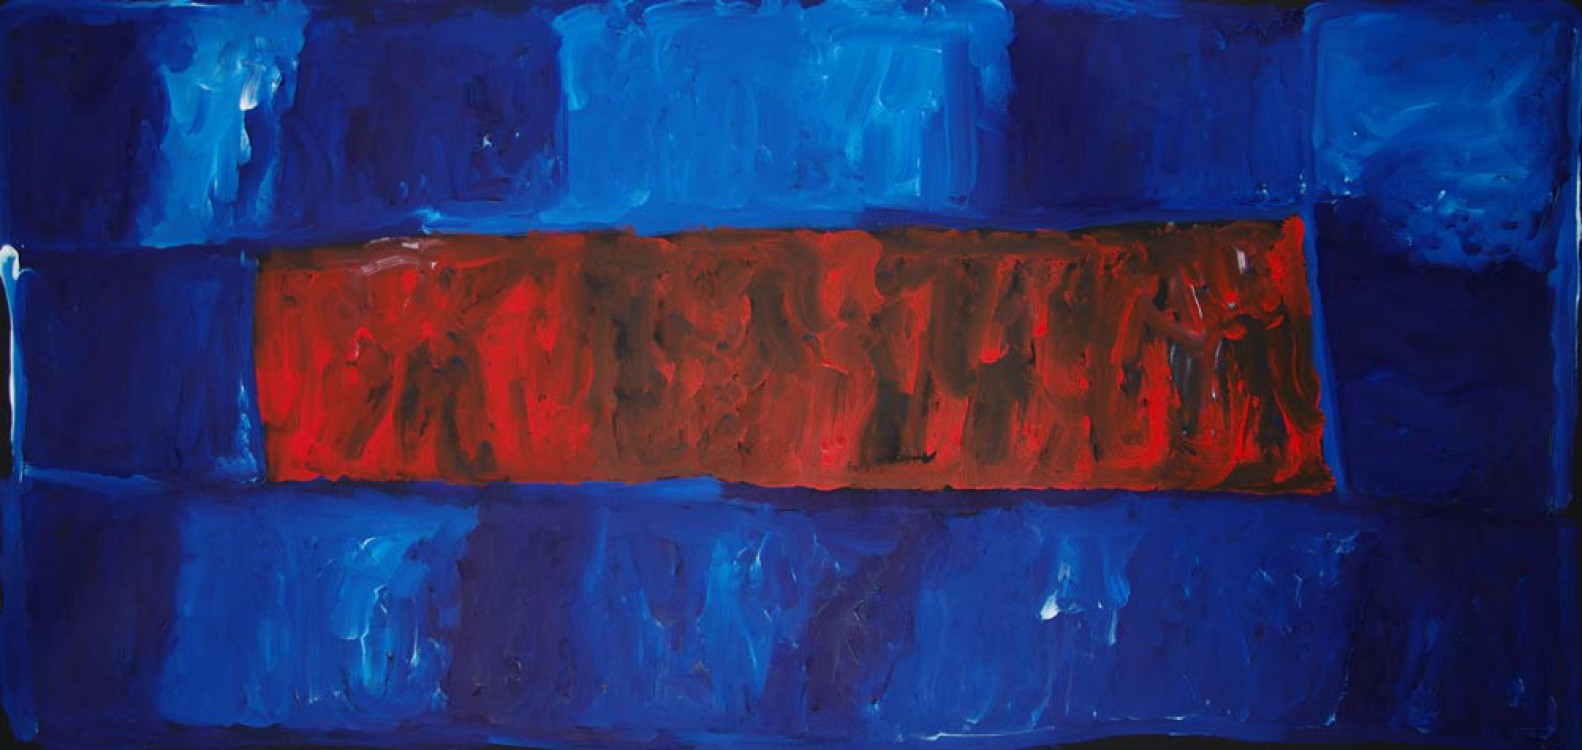 Kudditji Kngwarreye My Country Australian Aboriginal Art Painting on canvas KK1665